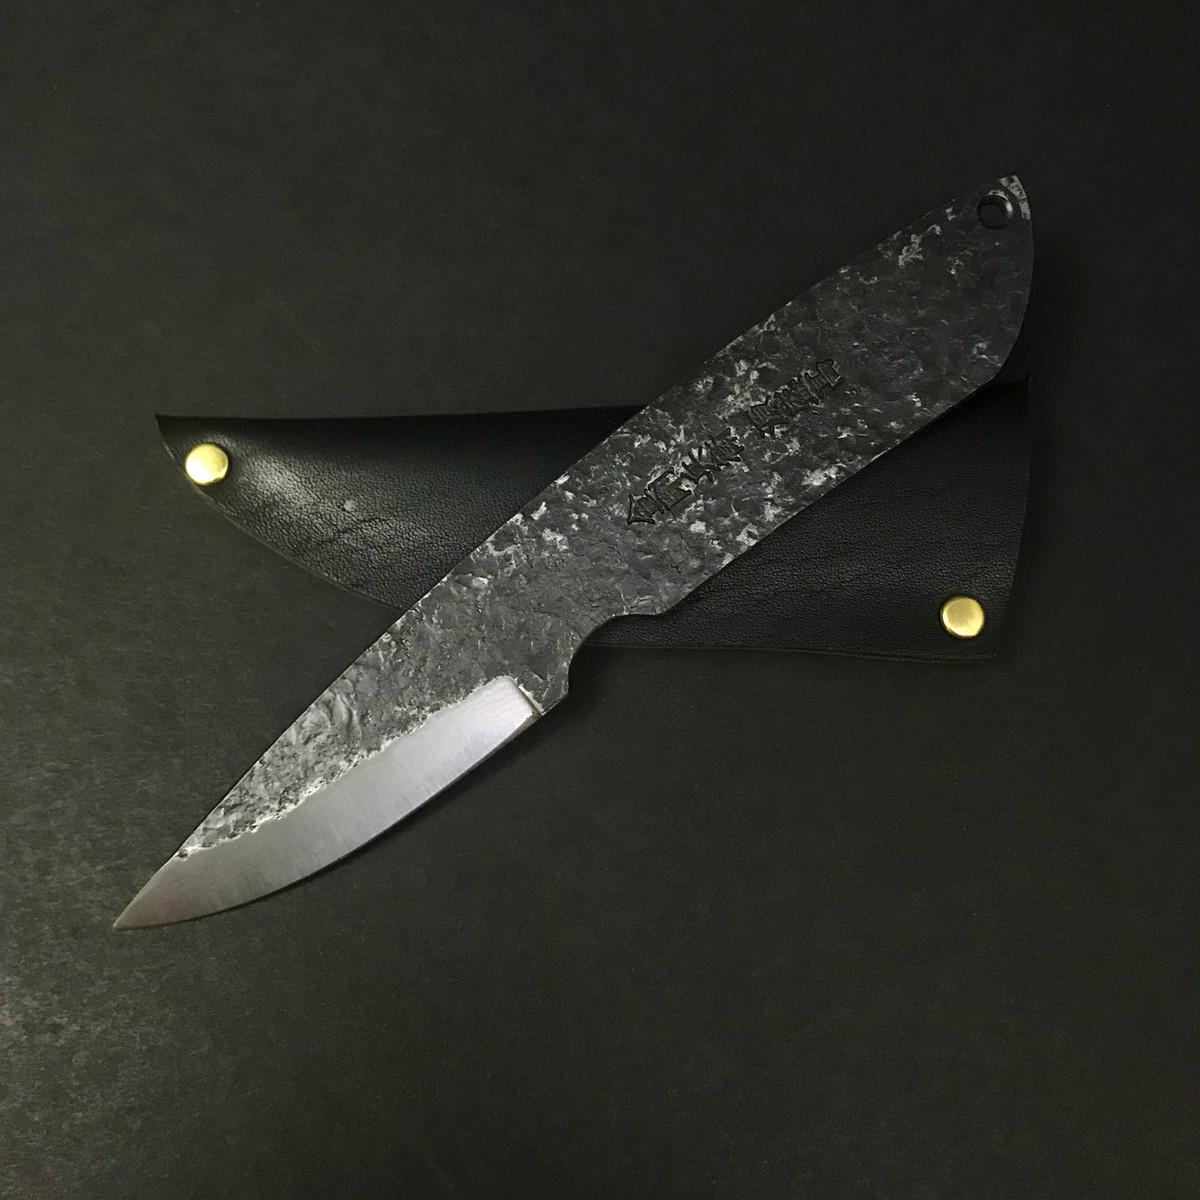 Moritaka - Craft Knife - Aogami #2 Damascus